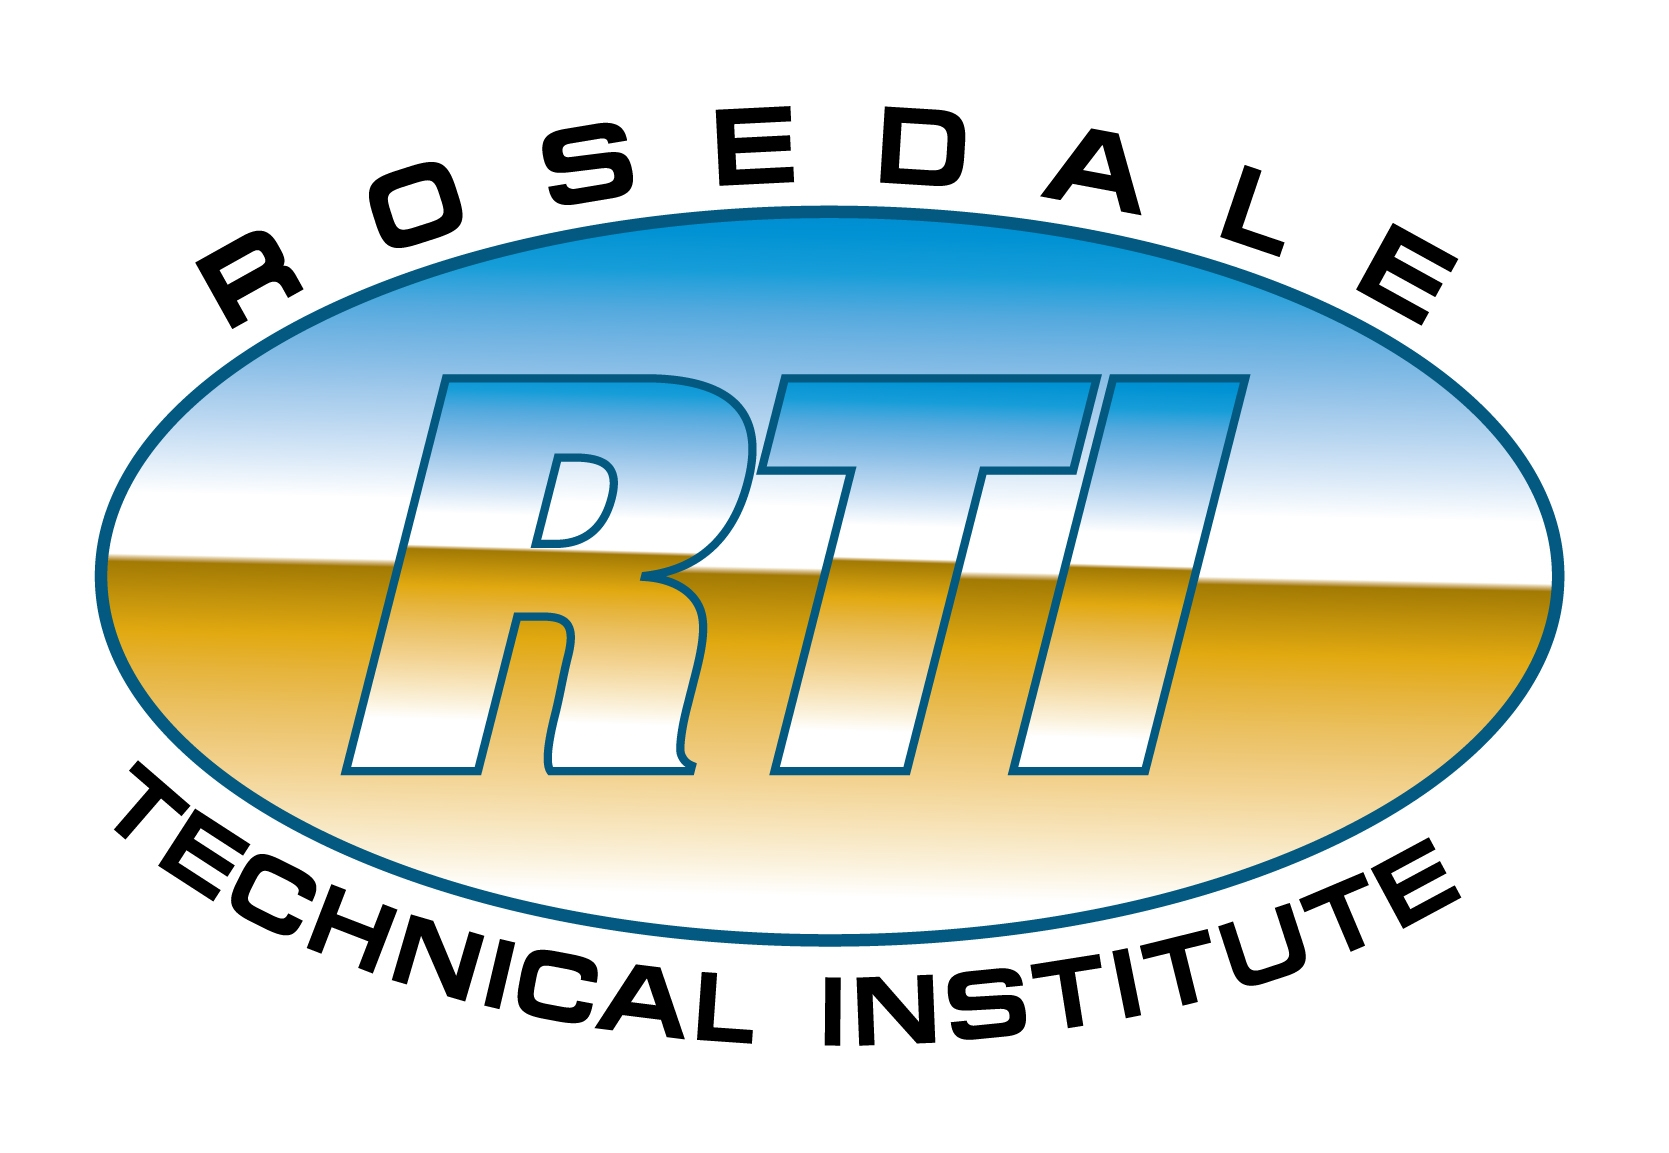 Rosedale Technical Institute logo